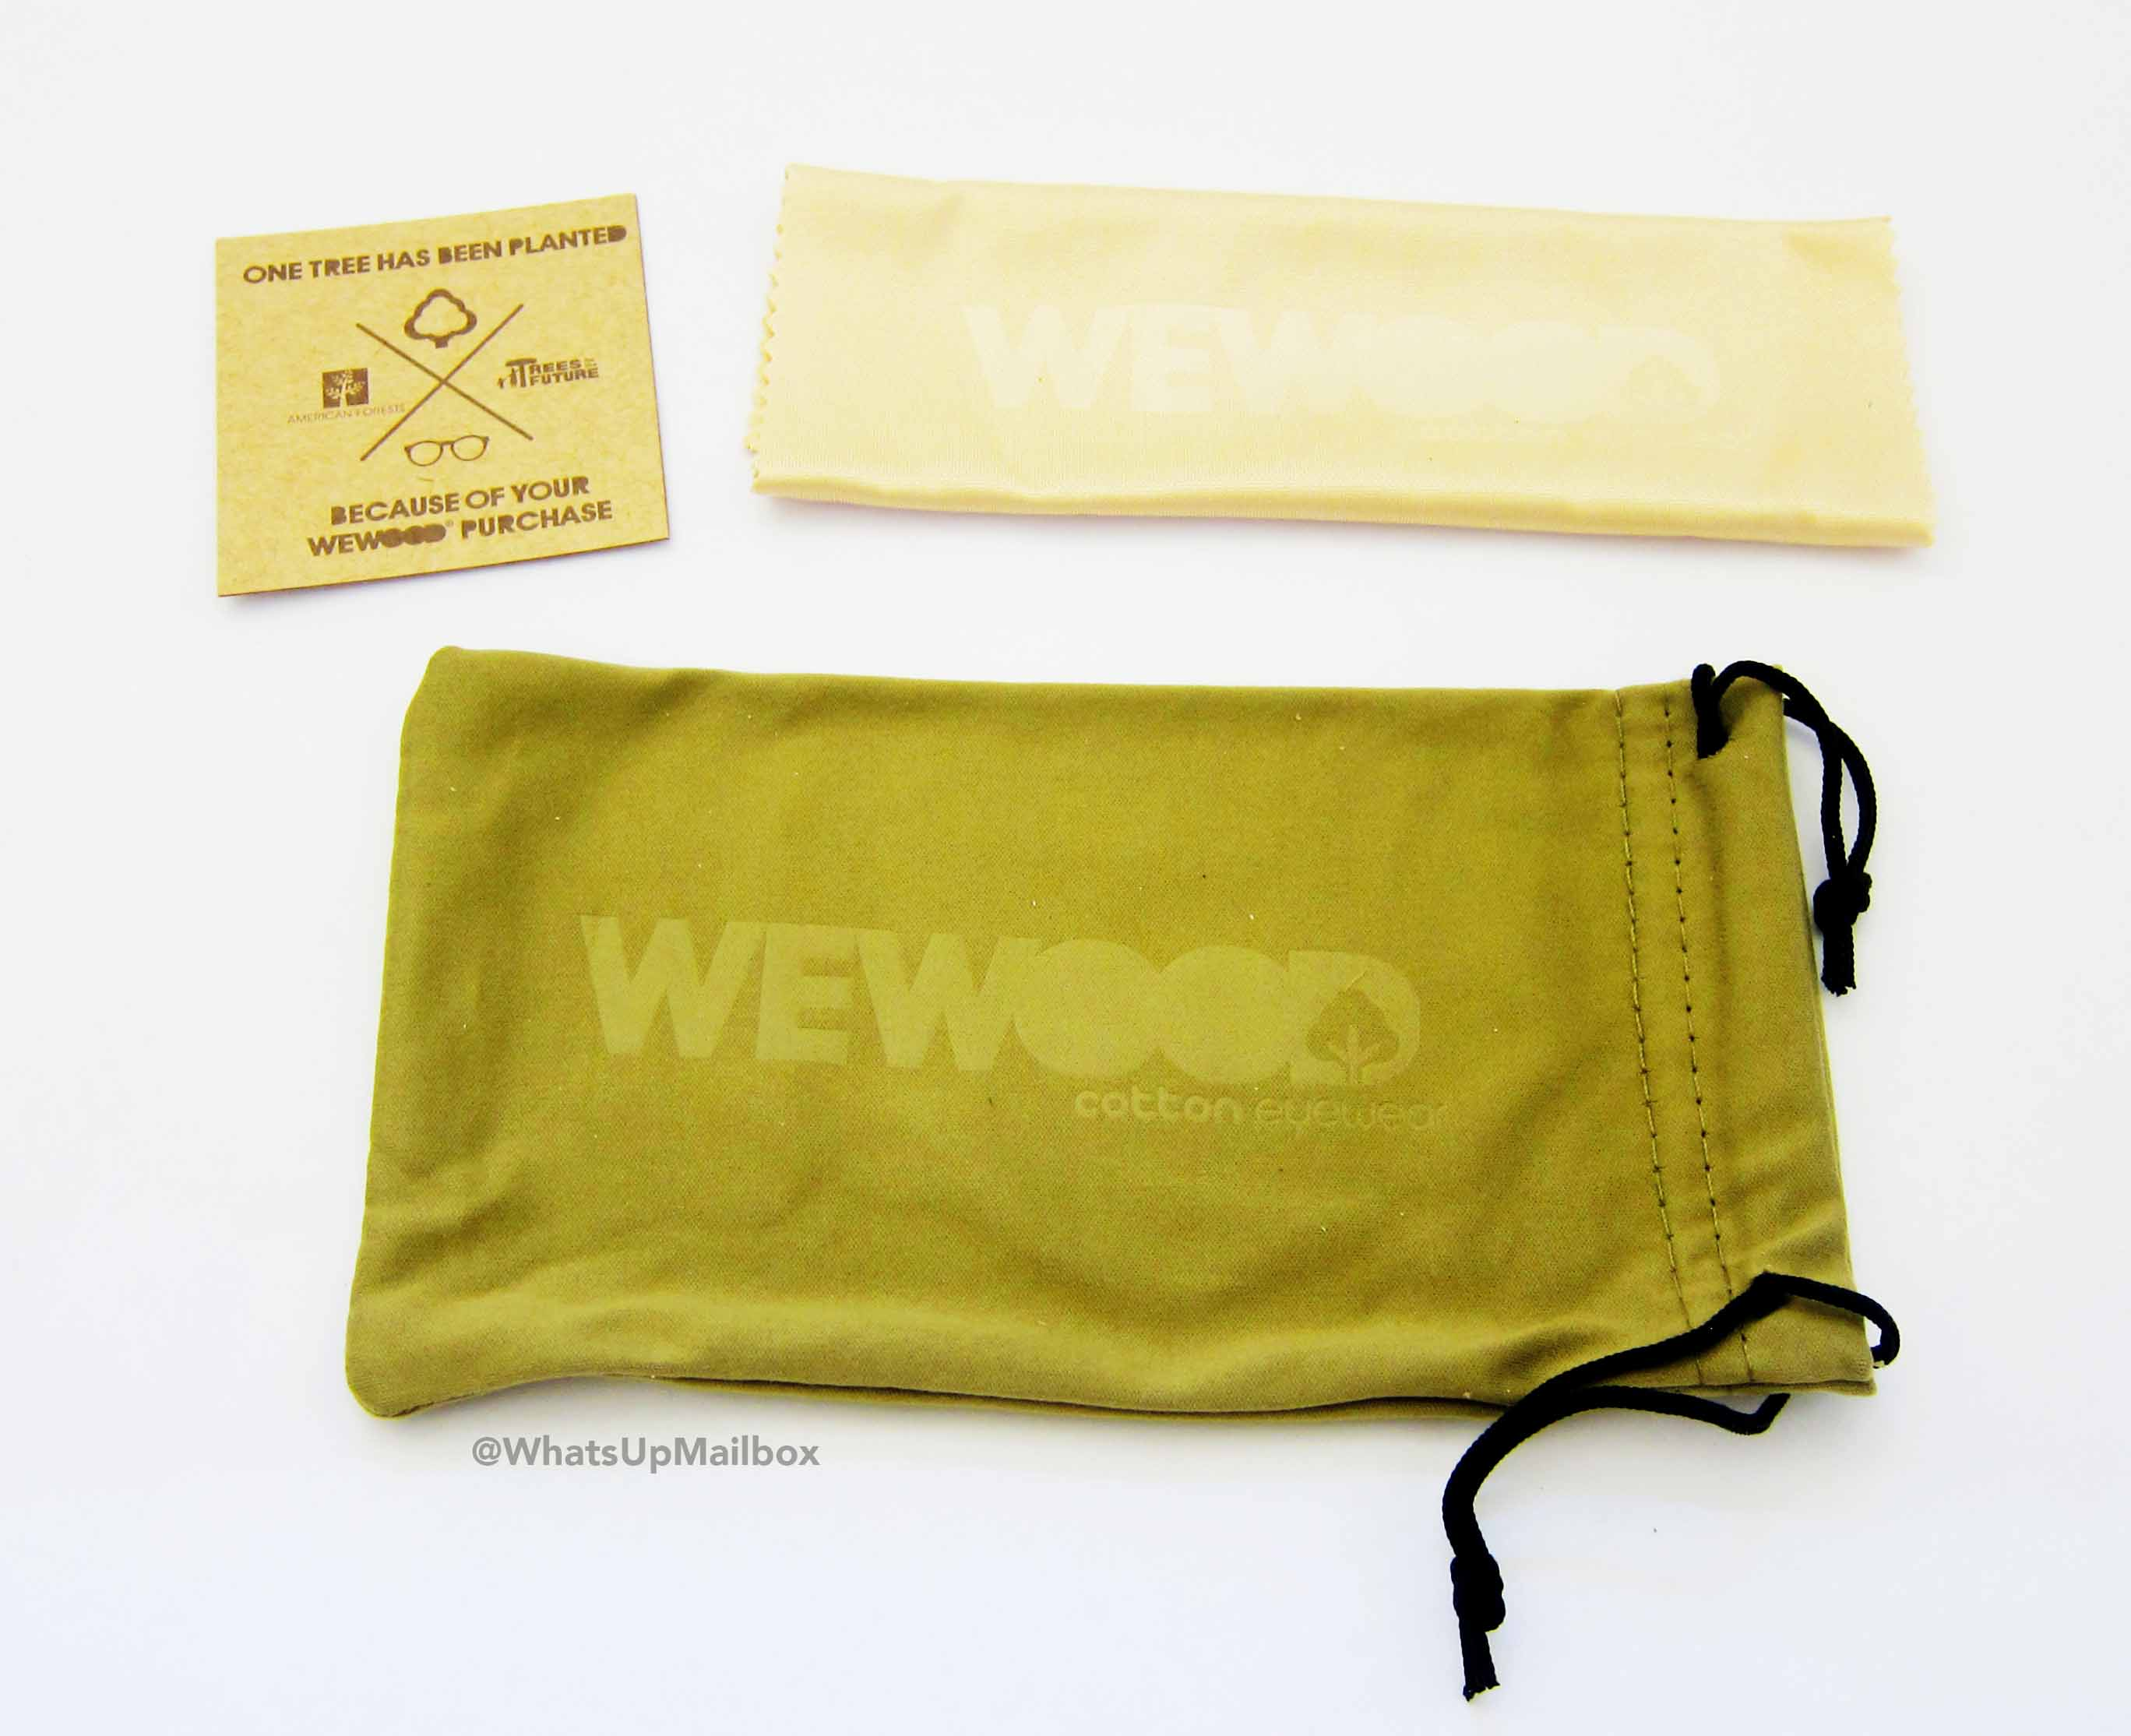 WeWood Xipe BL 7060 Sunglasses